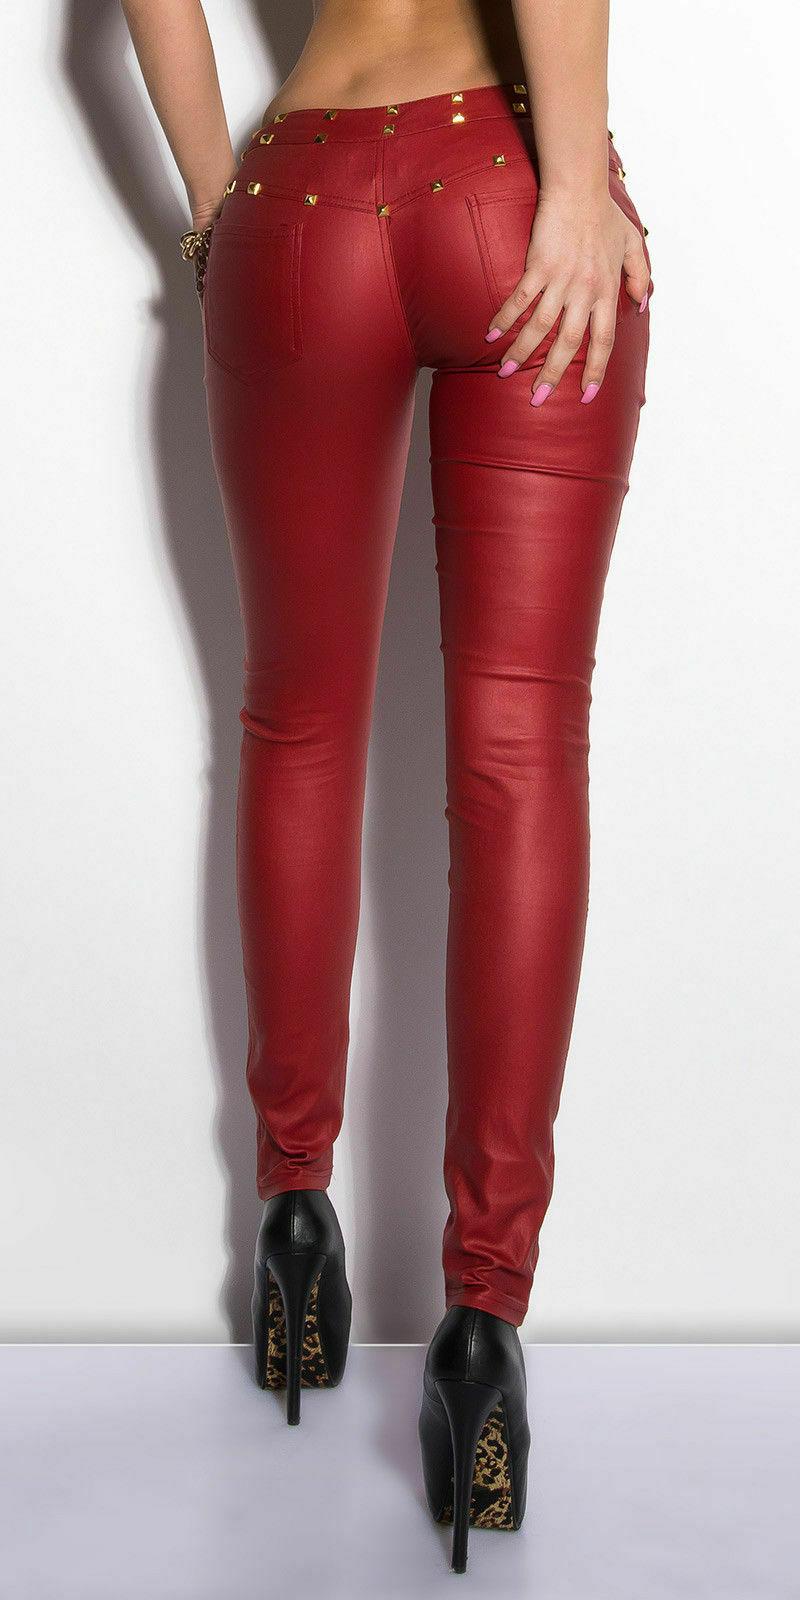 Women/'s Skinny Slim Faux leather Pants Ladies biker stretch Trousers UK 6-14